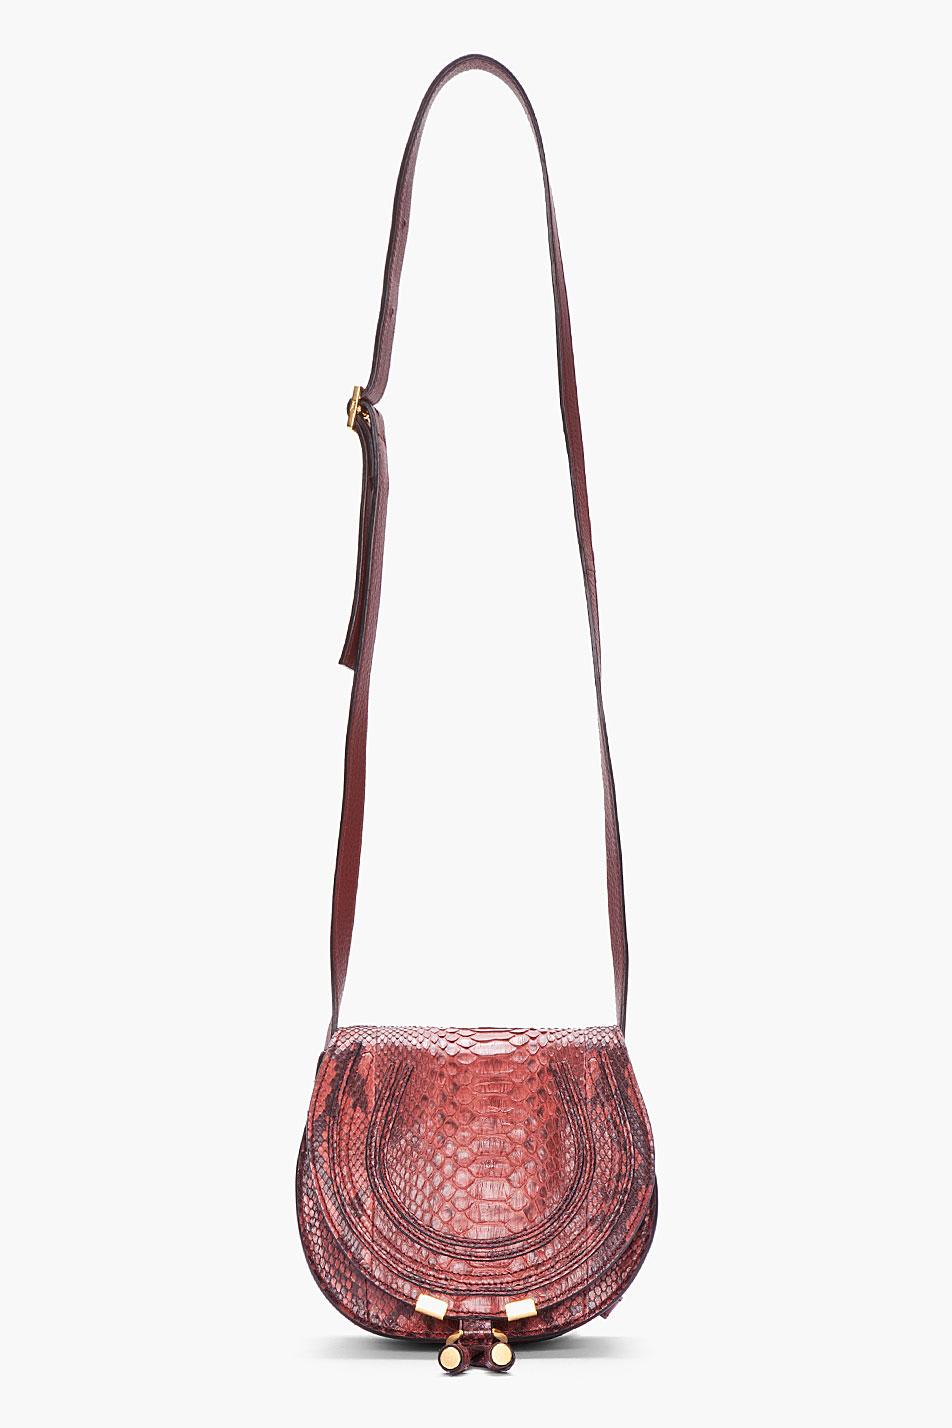 Chlo 233 Burgundy Python Leather Marcie Bag In Red Lyst